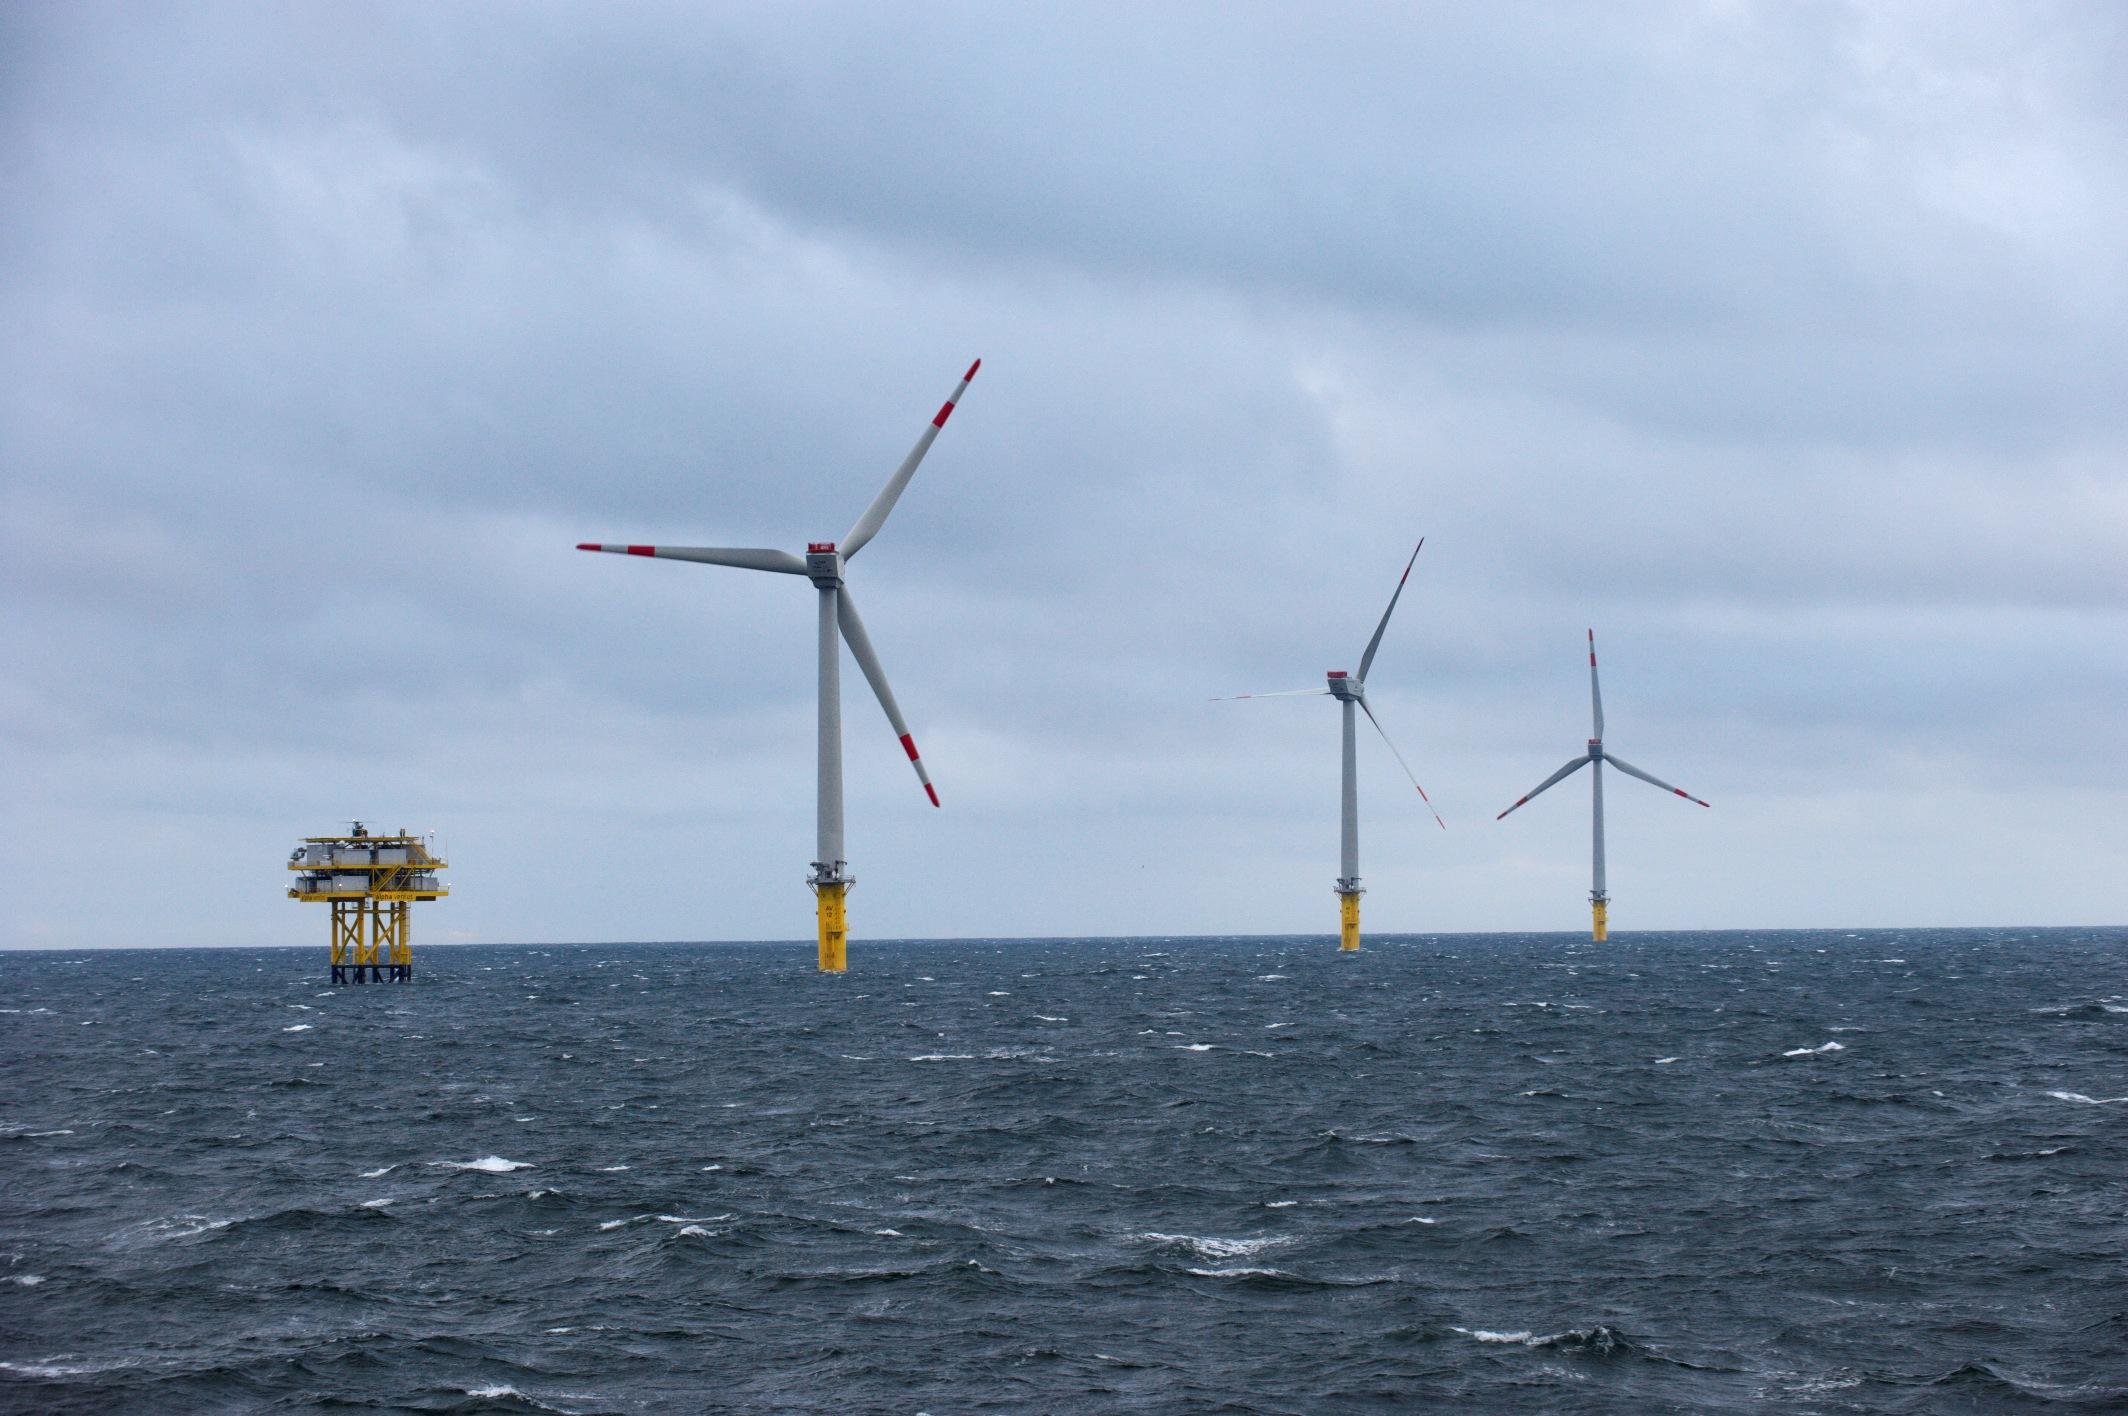 Francia. Parque eólico marino de 500 MW